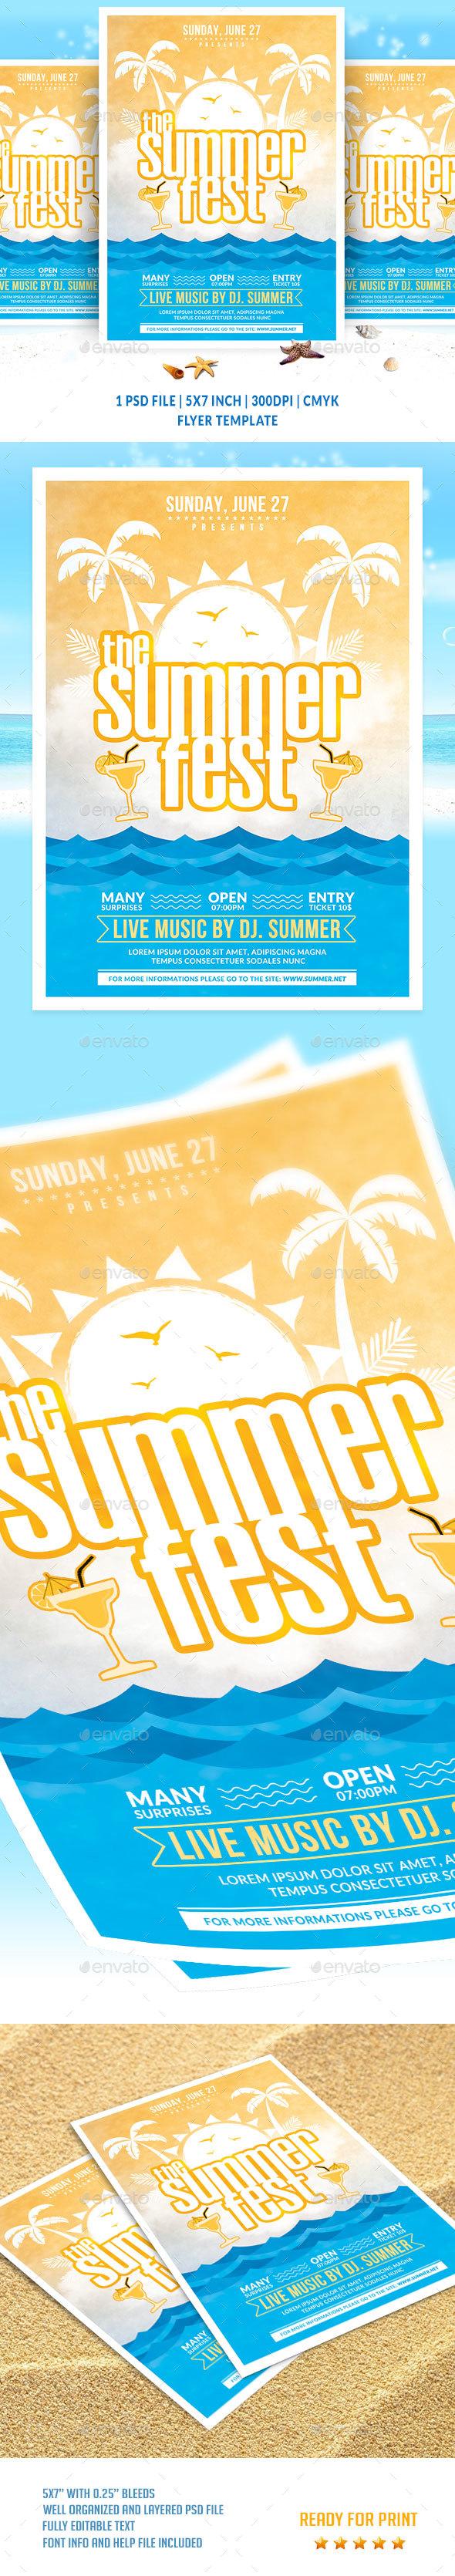 The Summer Fest Flyer Template